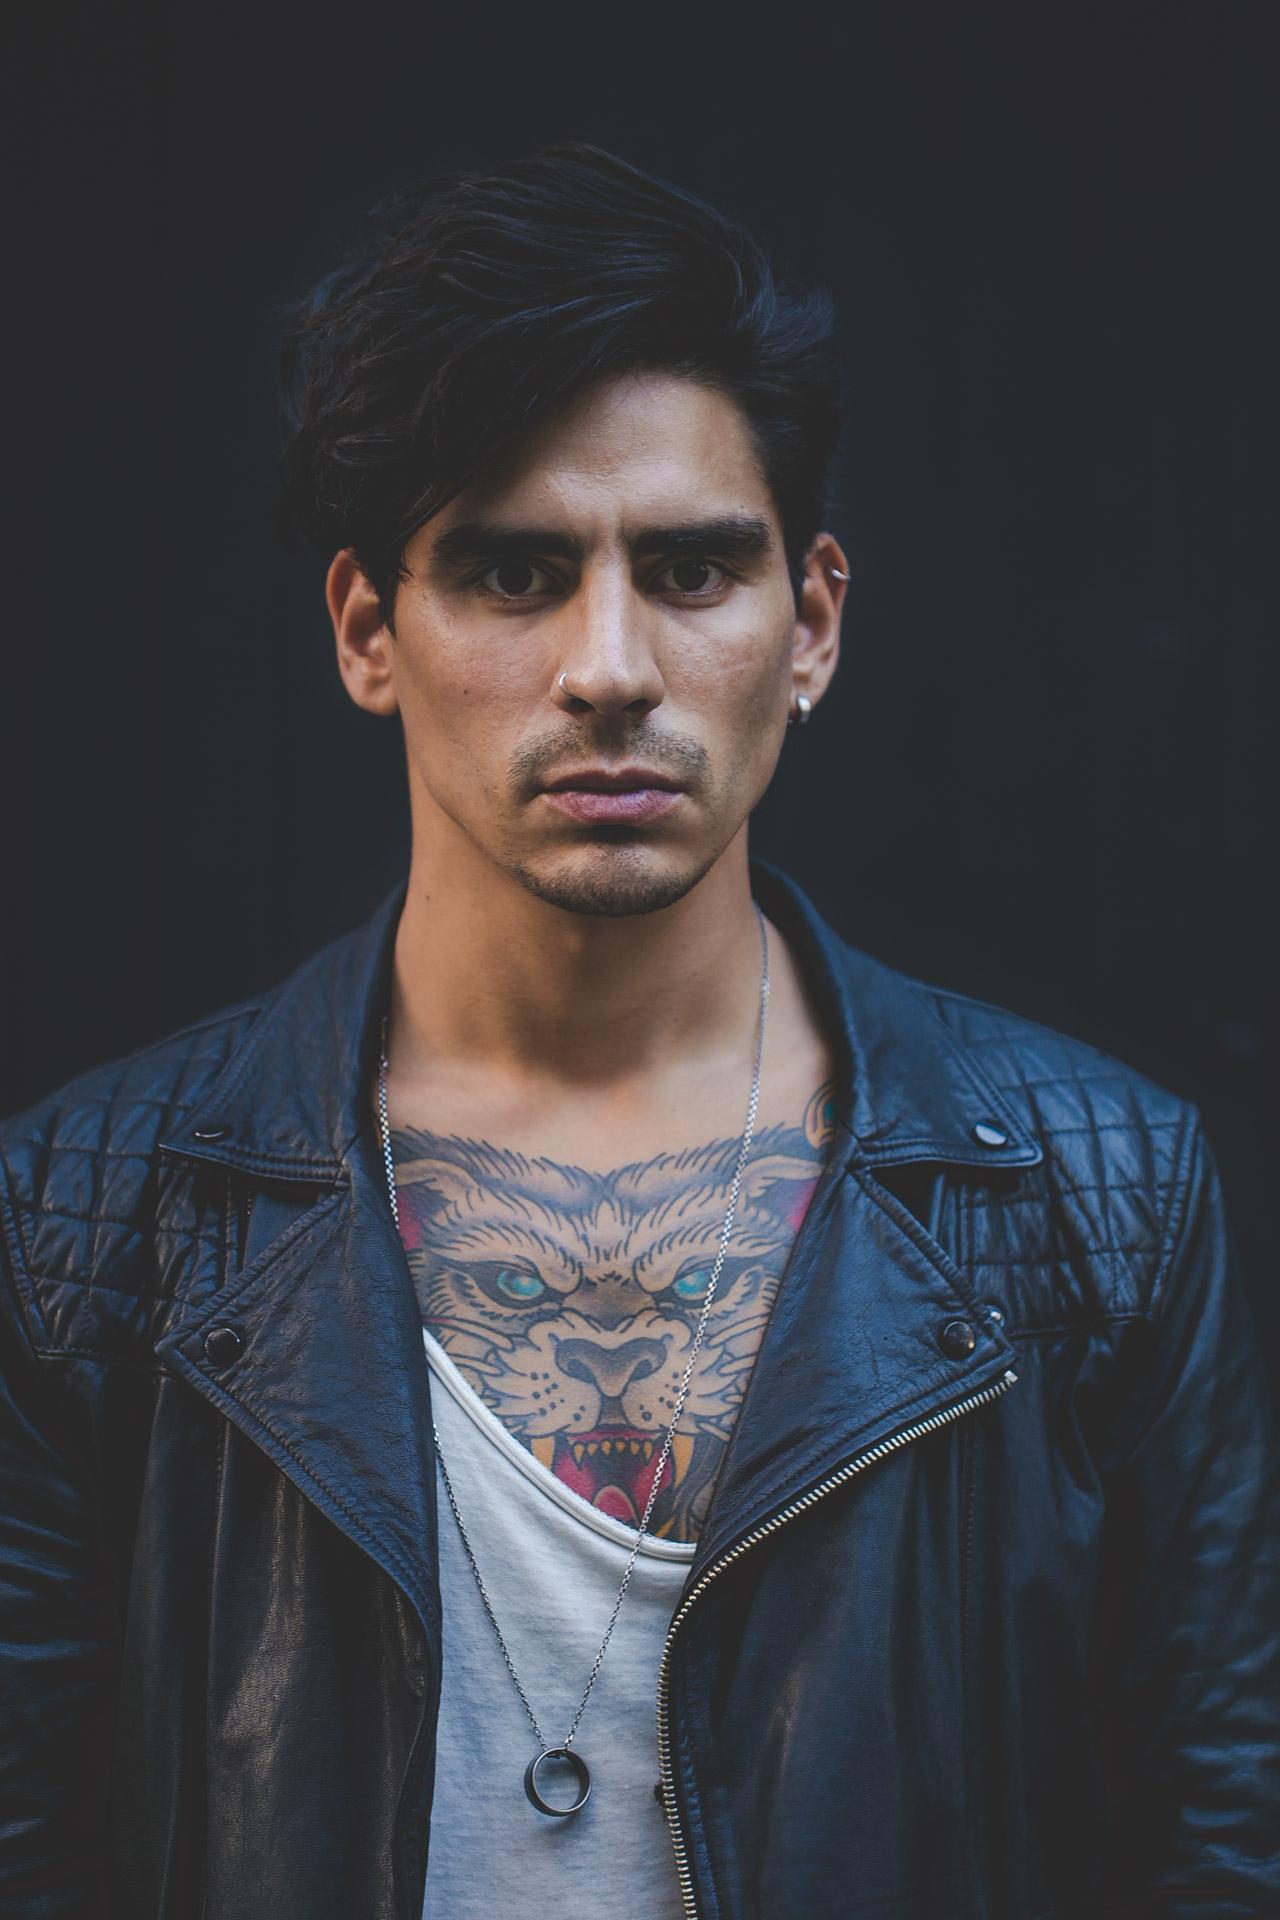 leather - tattoos - menswear